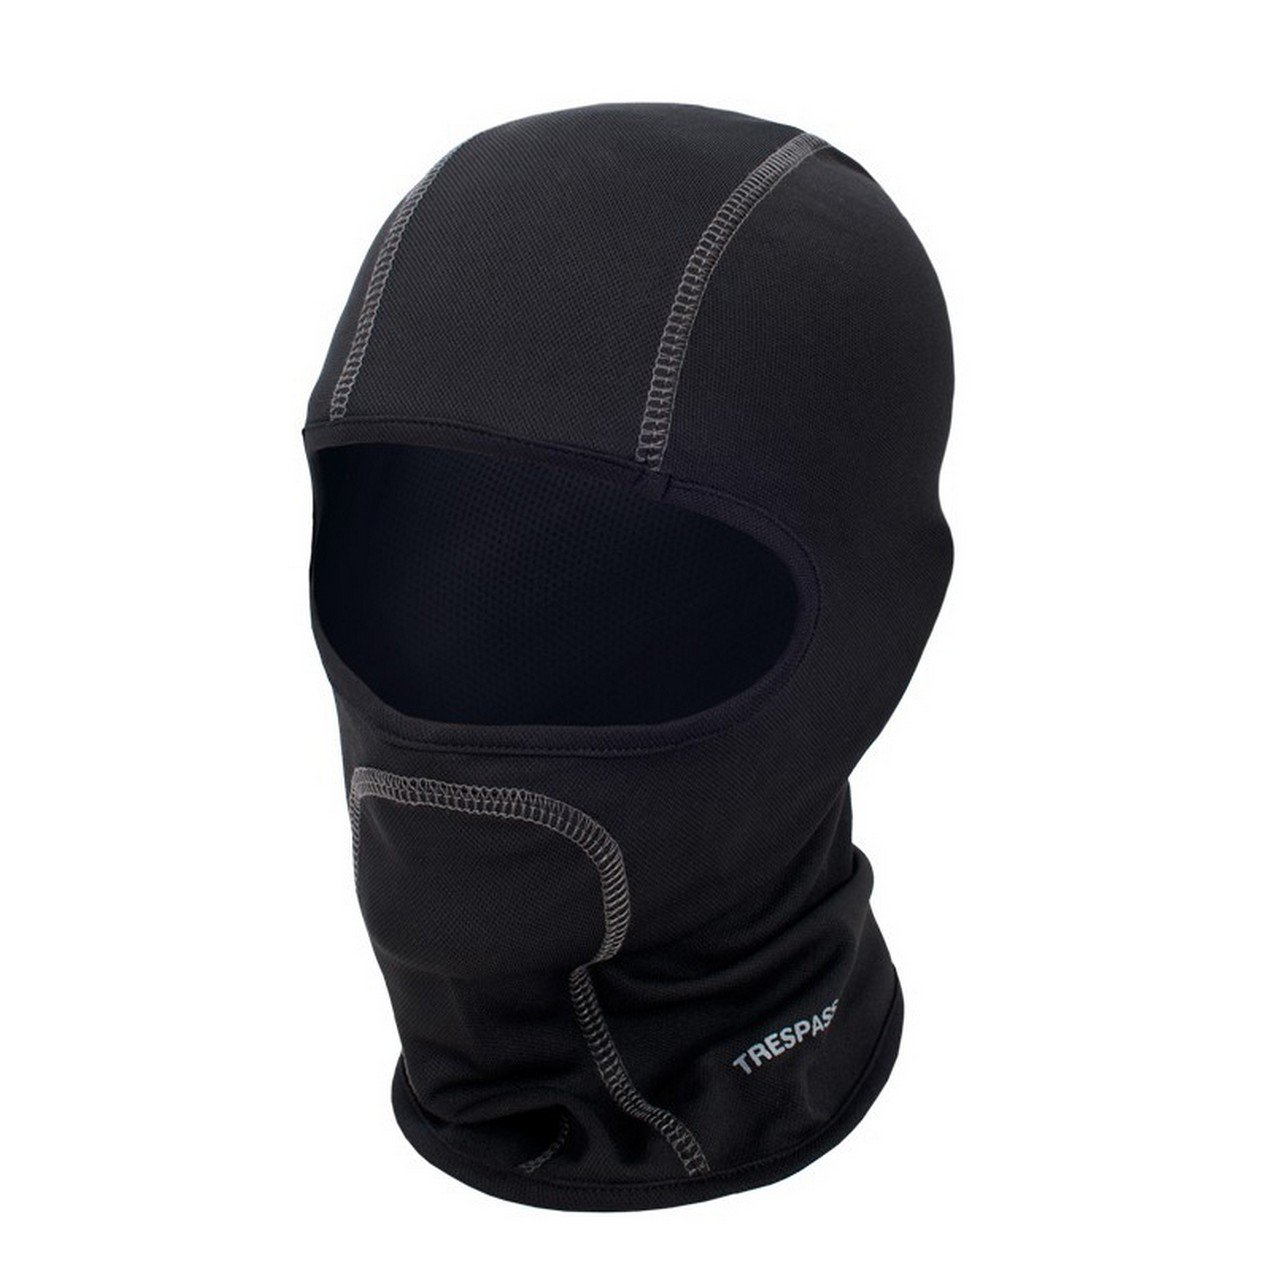 Trespass Kids Unisex Moulder Winter Balaclava (One Size) (Black) UTTP998_1